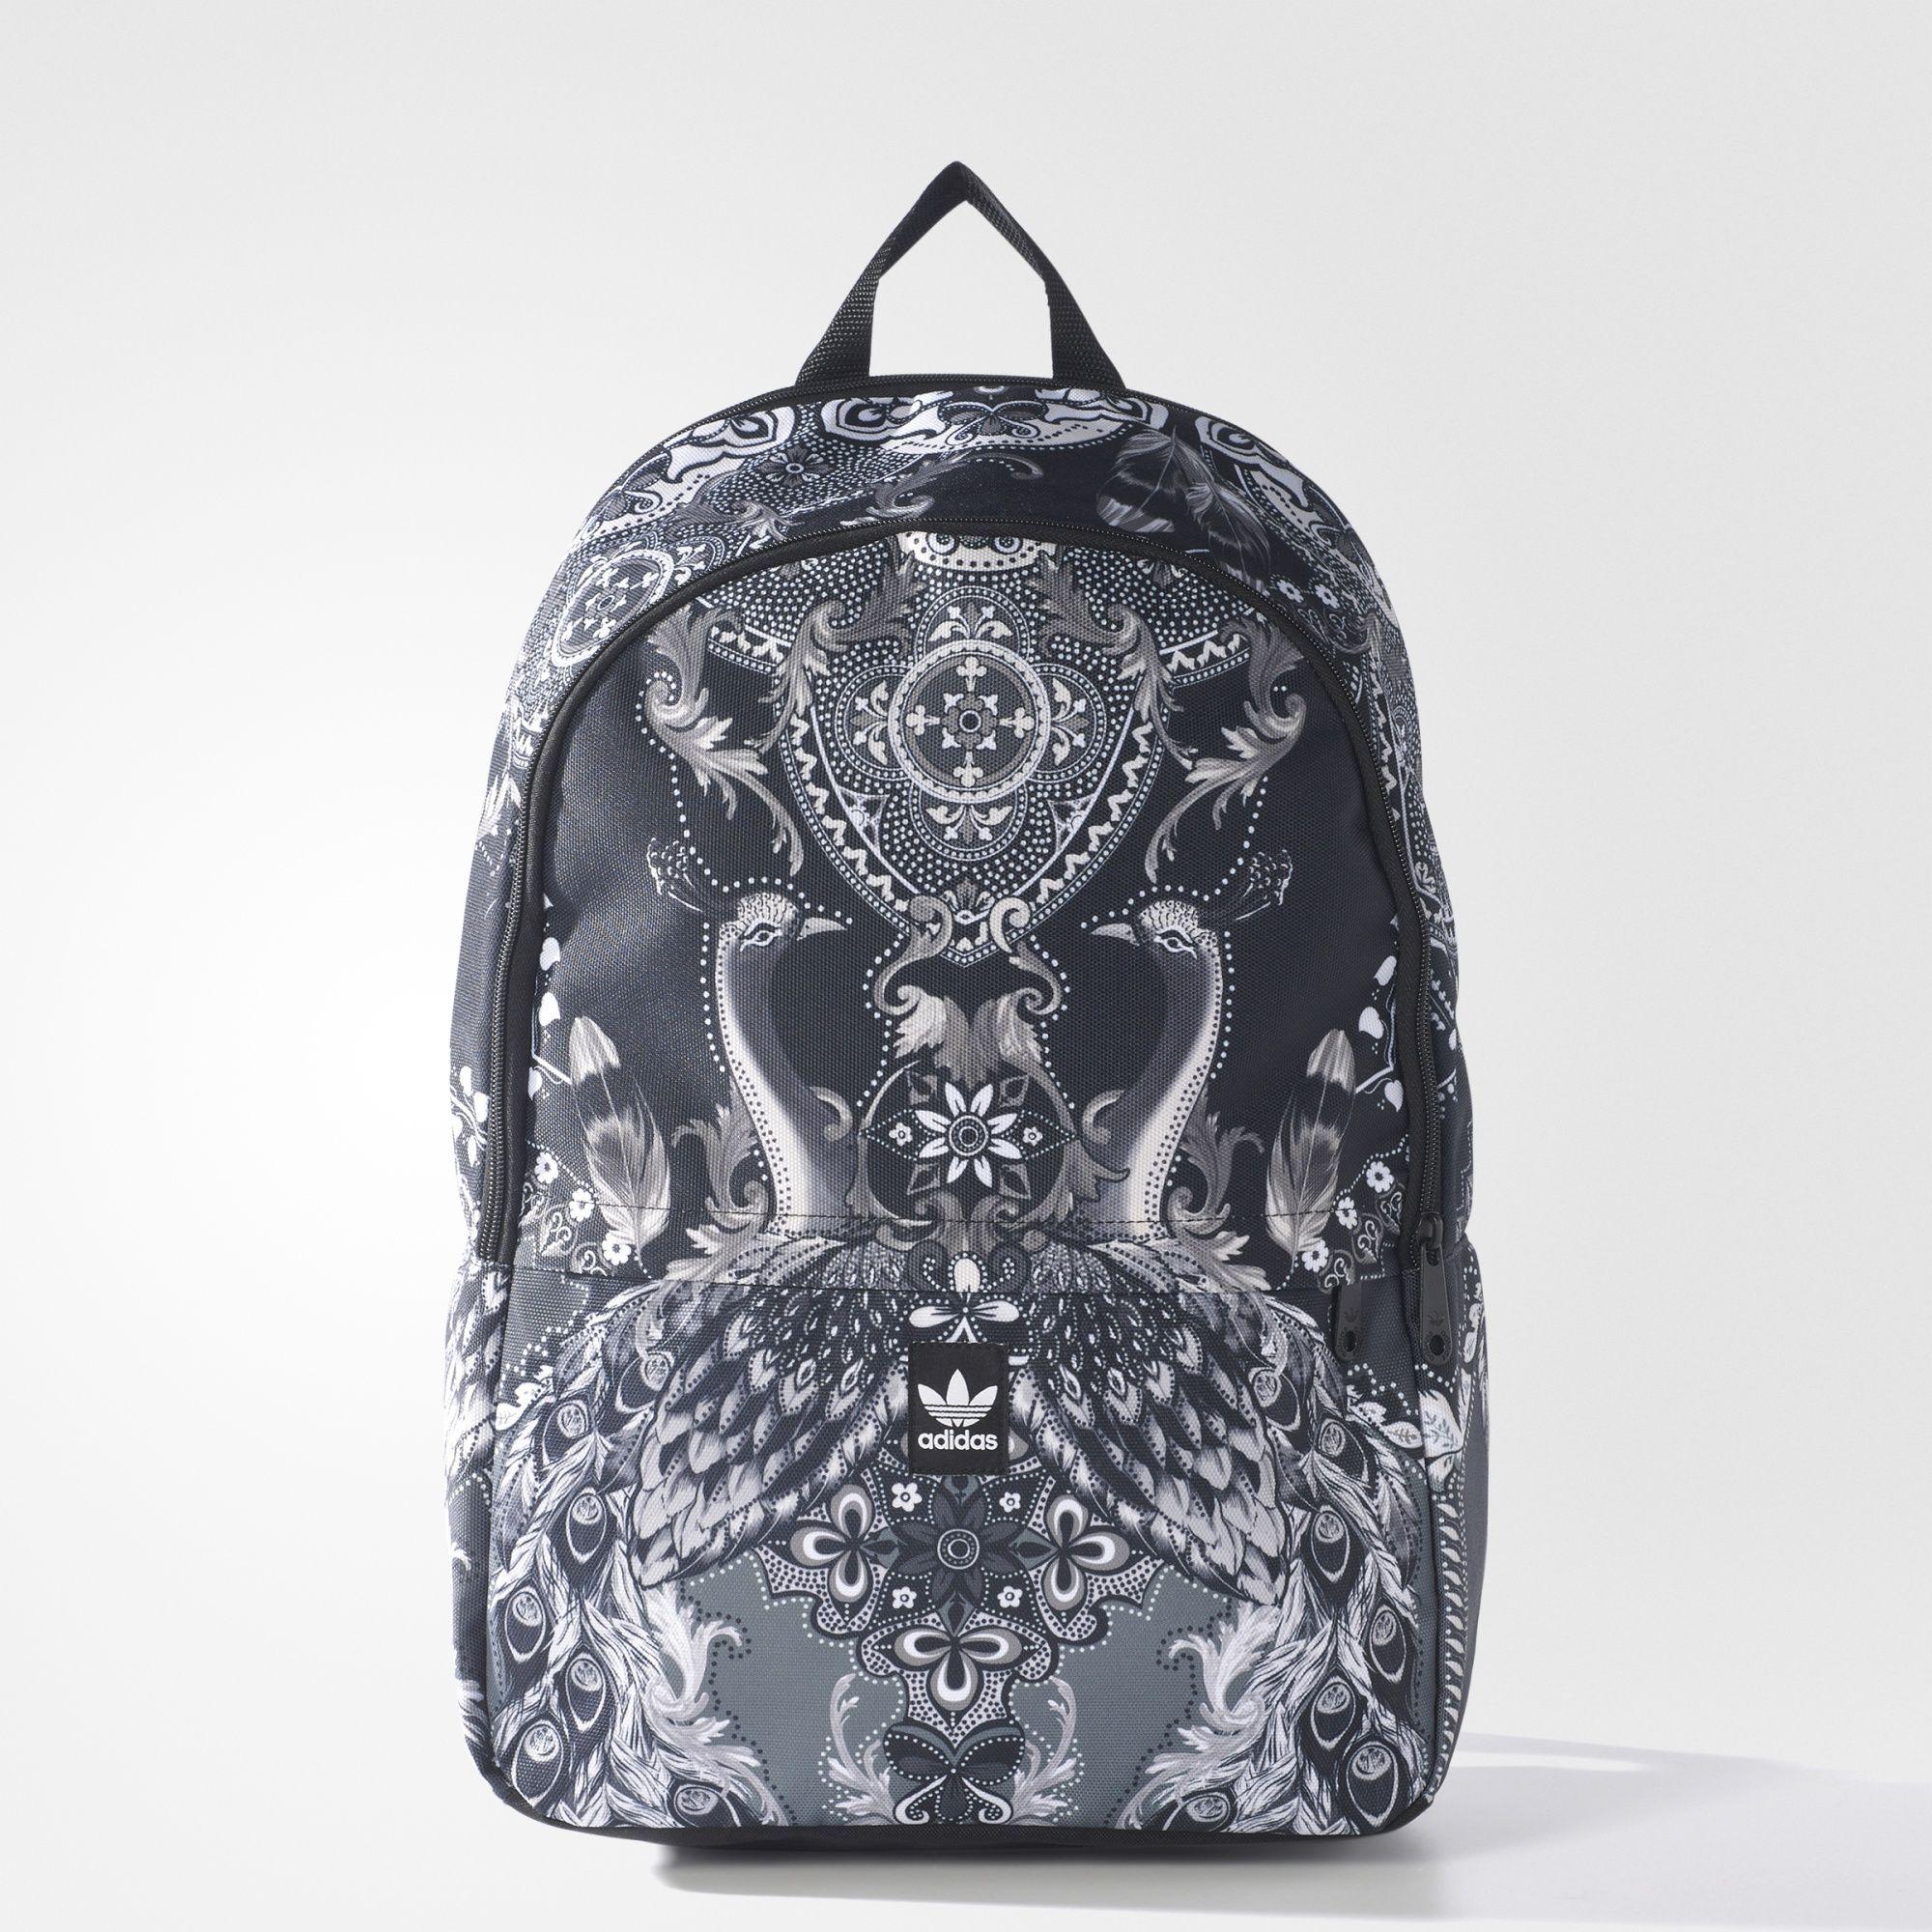 adidas - Mochila Pavao Essentials   Bags - Bolsos   Pinterest ... f41533ff22